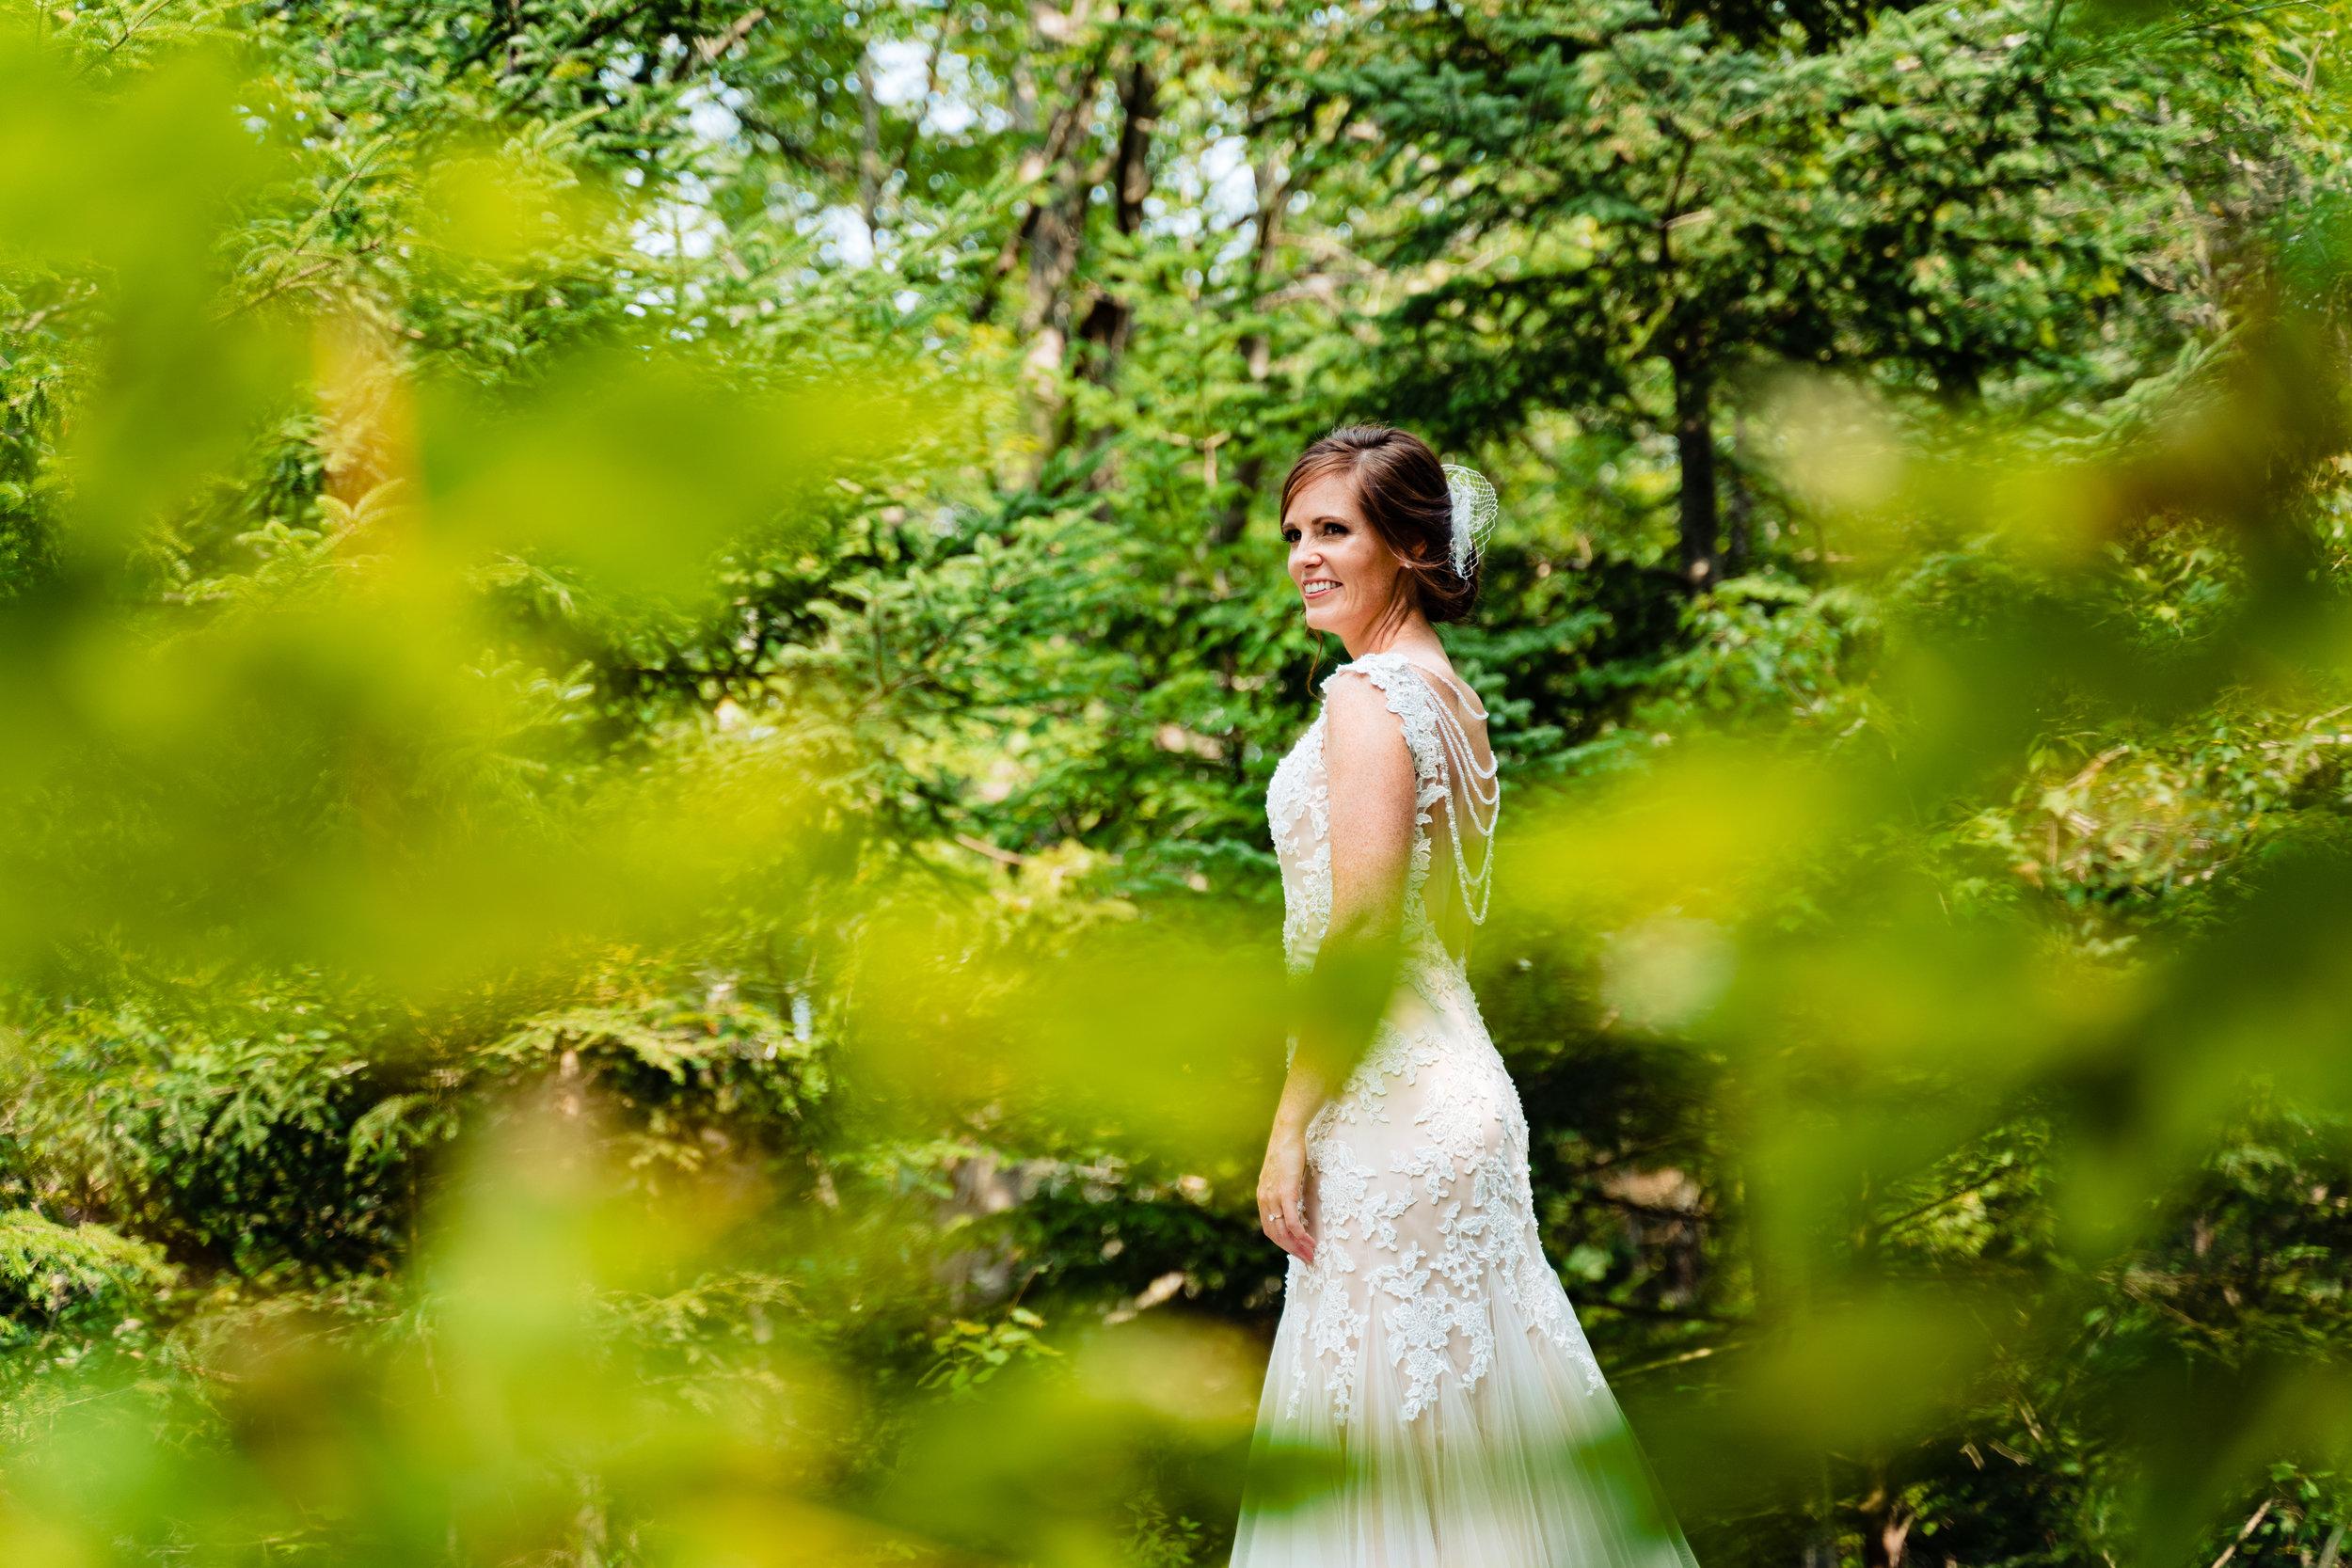 Jenna-Pat-154halifax-novascotia-weddingphotography-wedding-foxandfellow.jpg